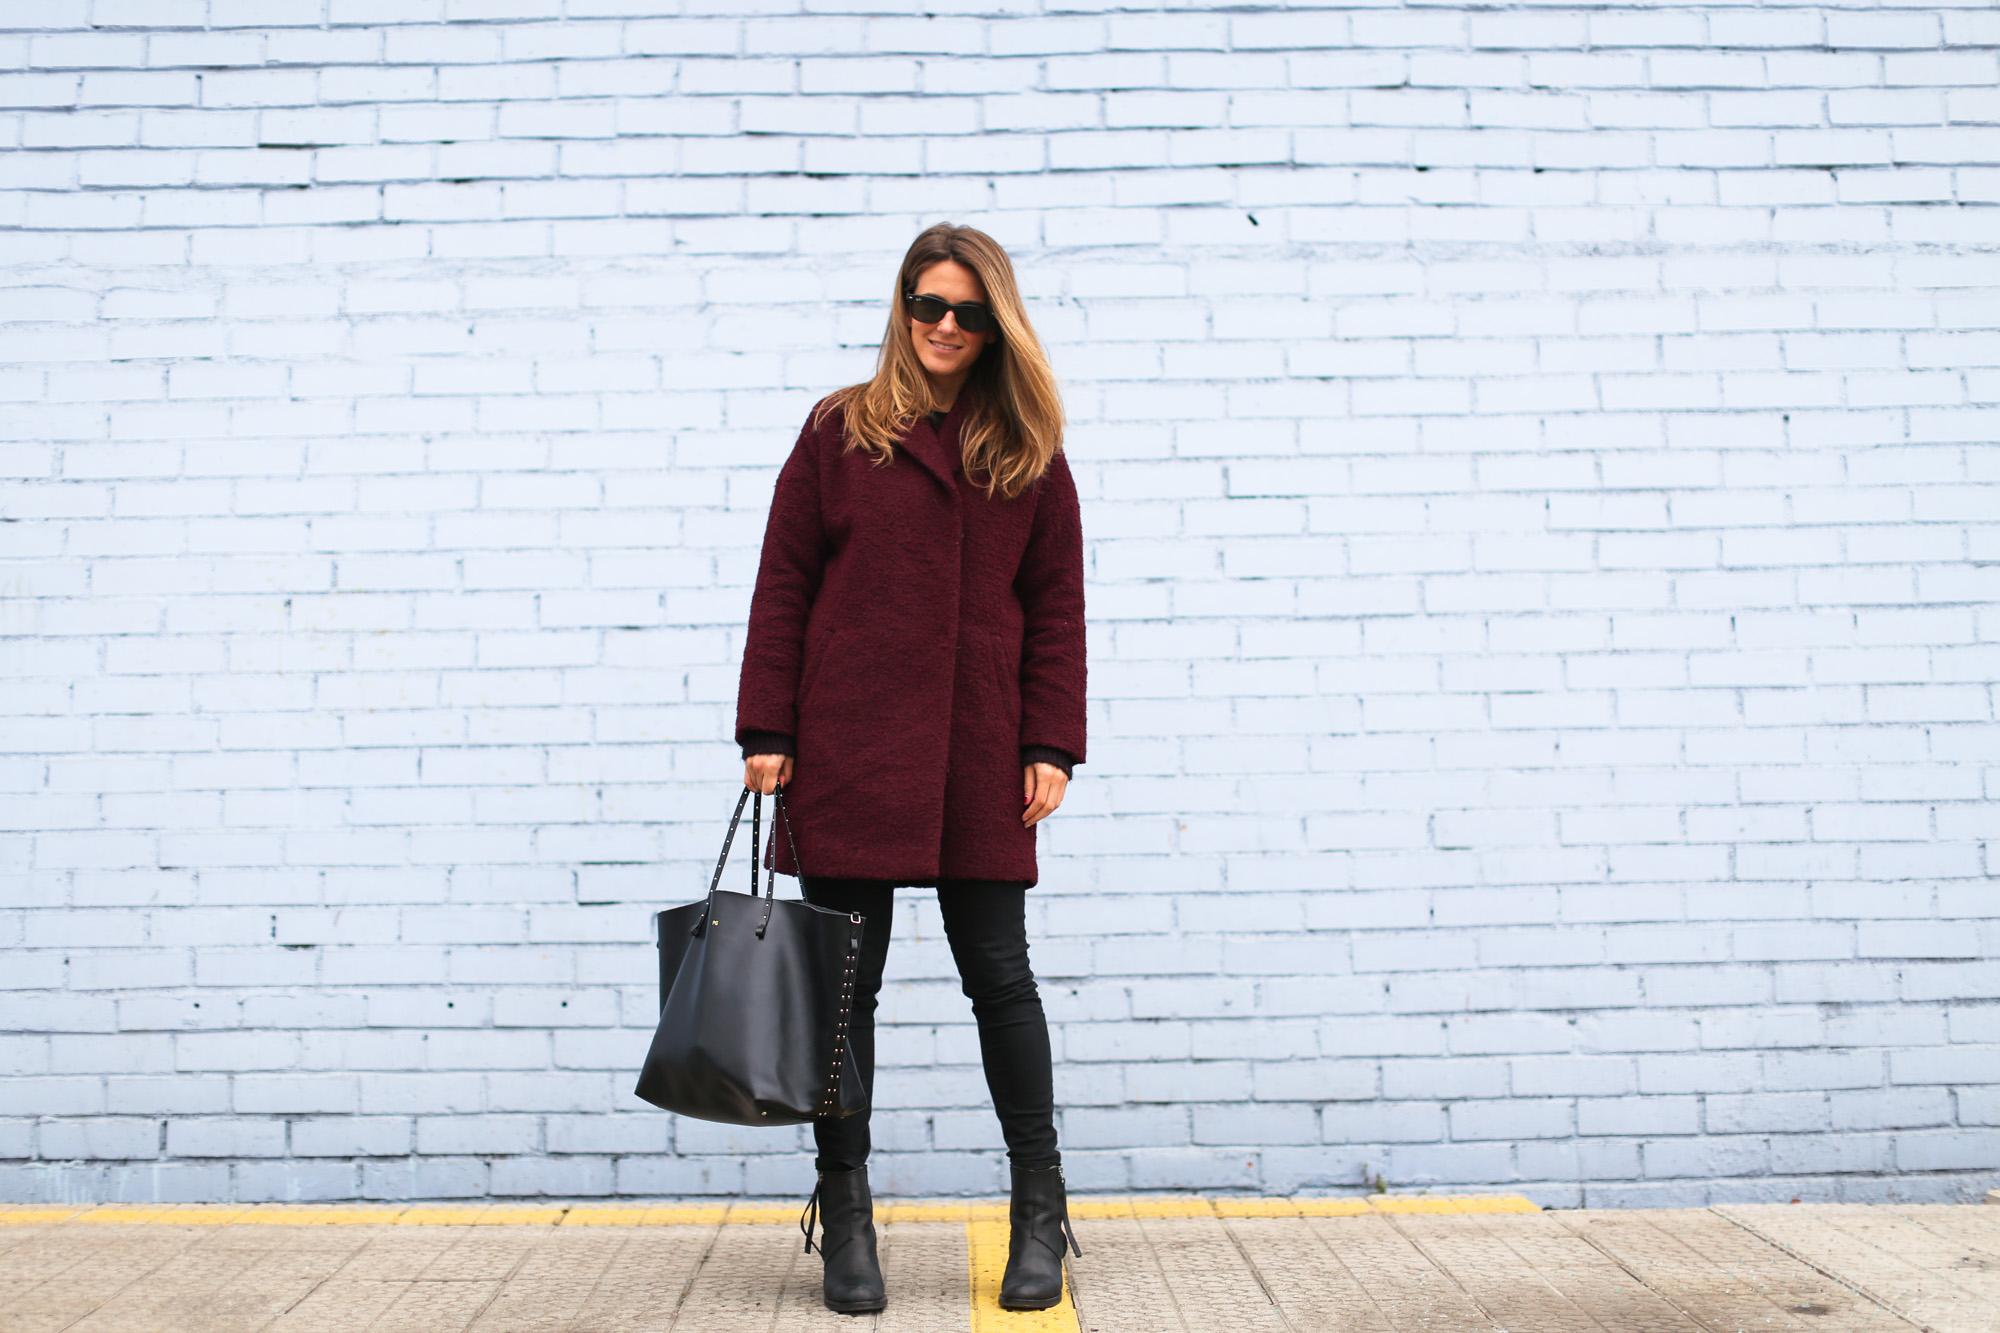 Clochet_streetstyle_burgundy_wool_coat_acne_studios_pistol_boots-4